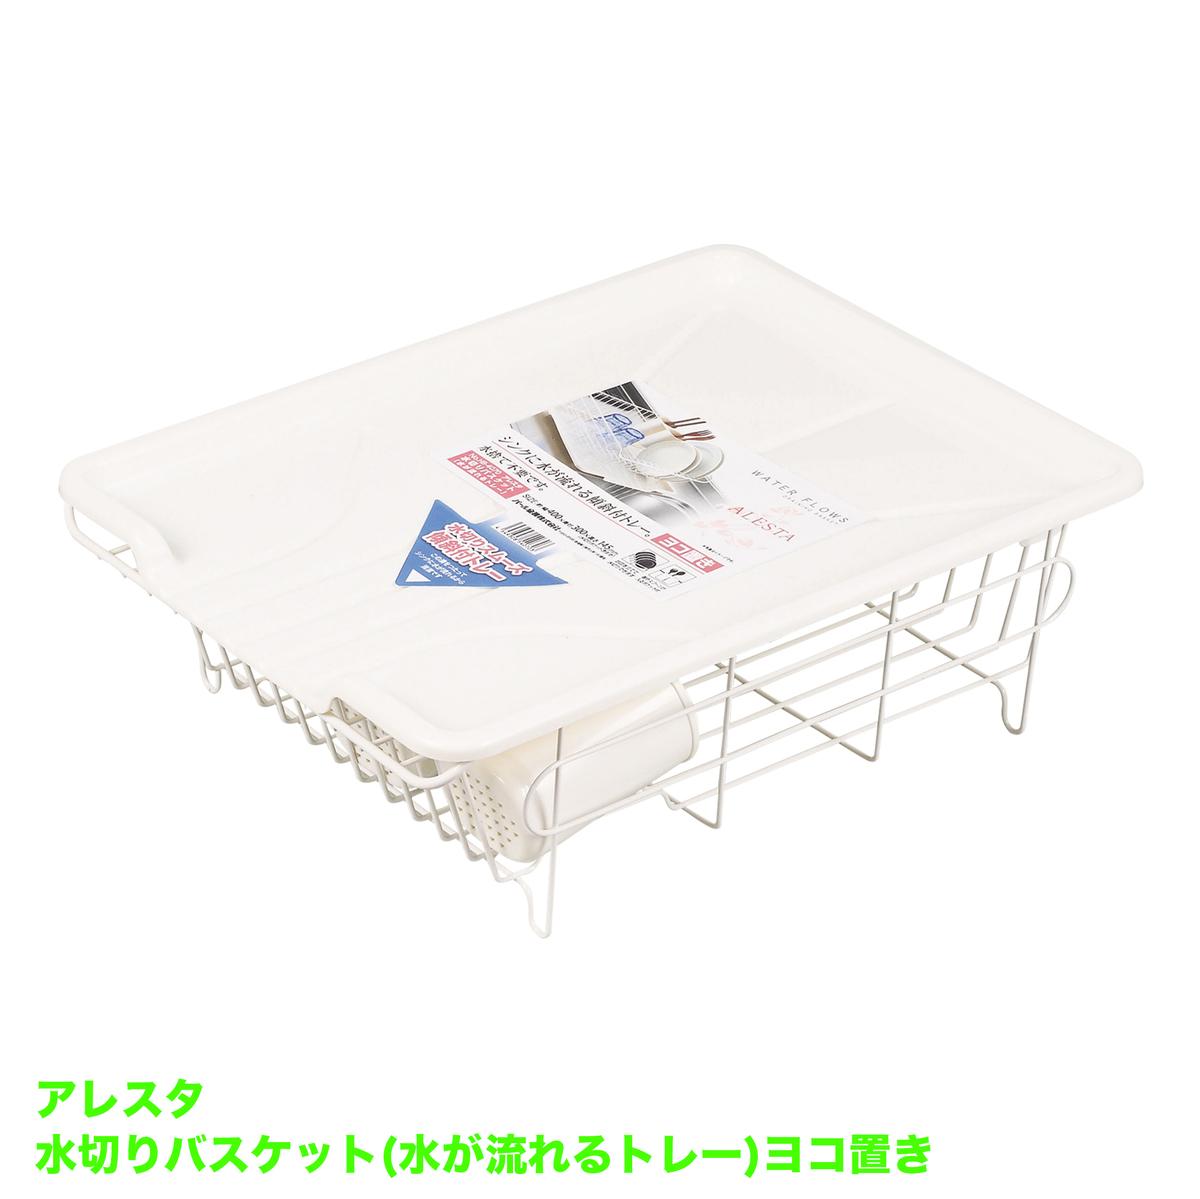 HB-4070 日本進口杯碗碟隔水盤